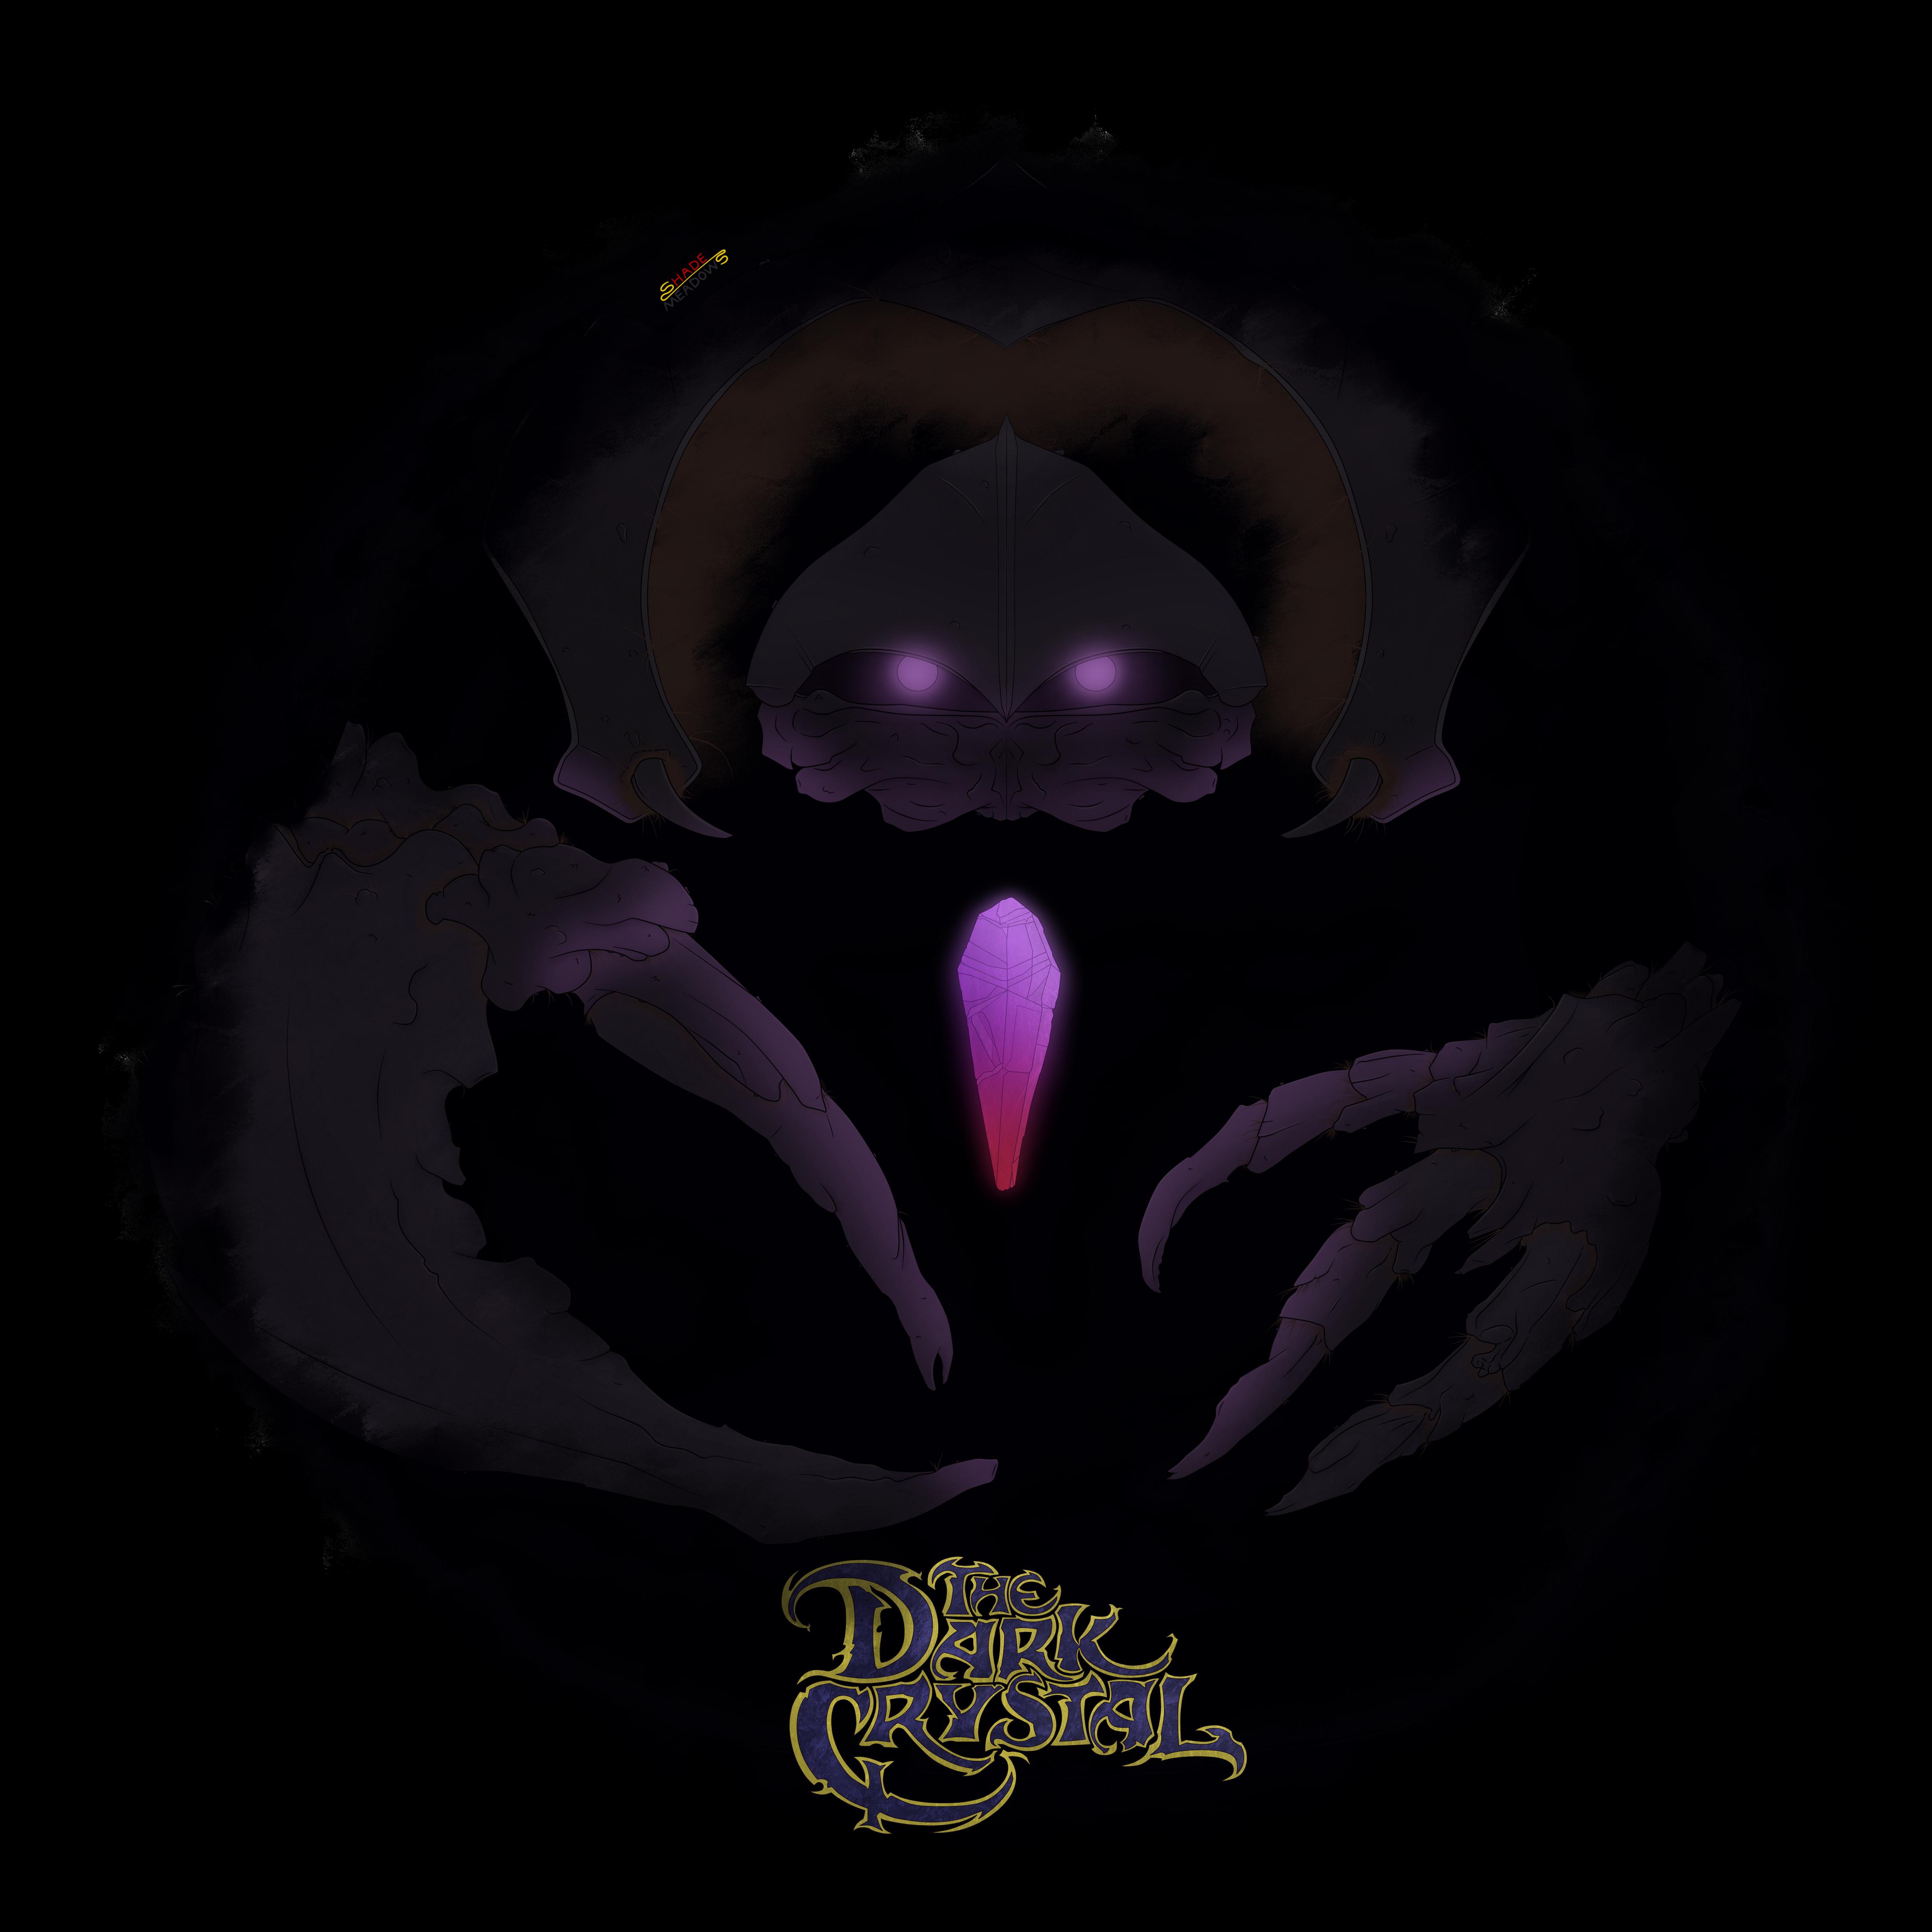 The Dark Crystal - The Garthim